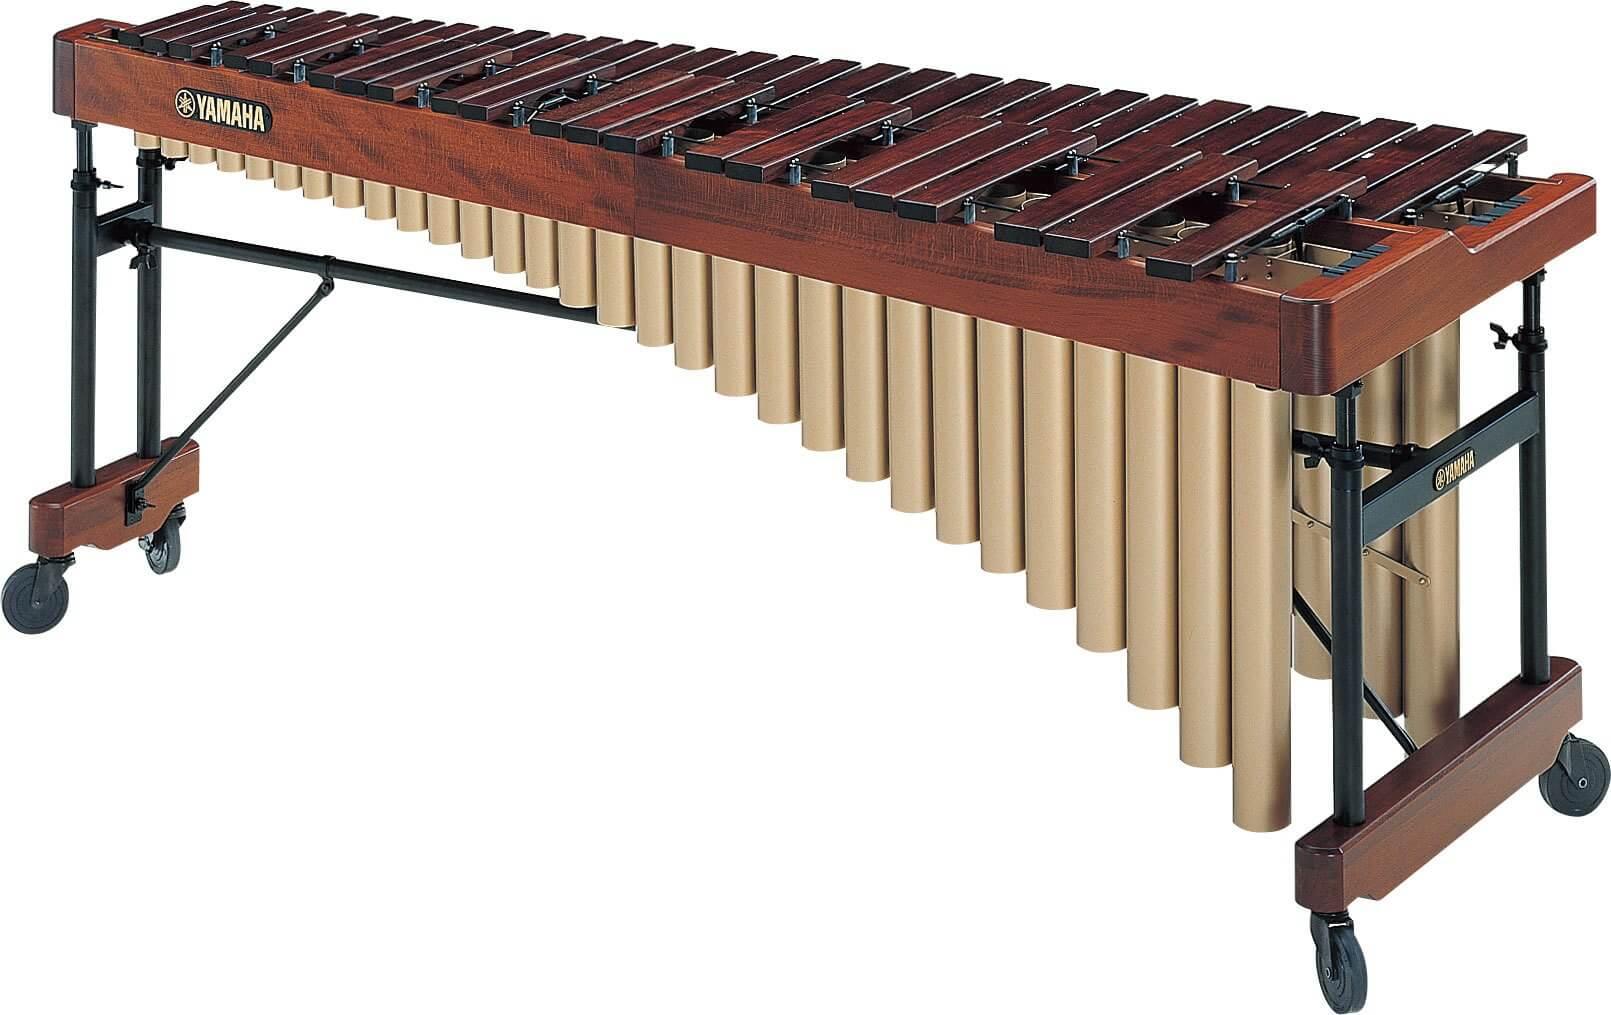 Marimba Yamaha Ym 4600A